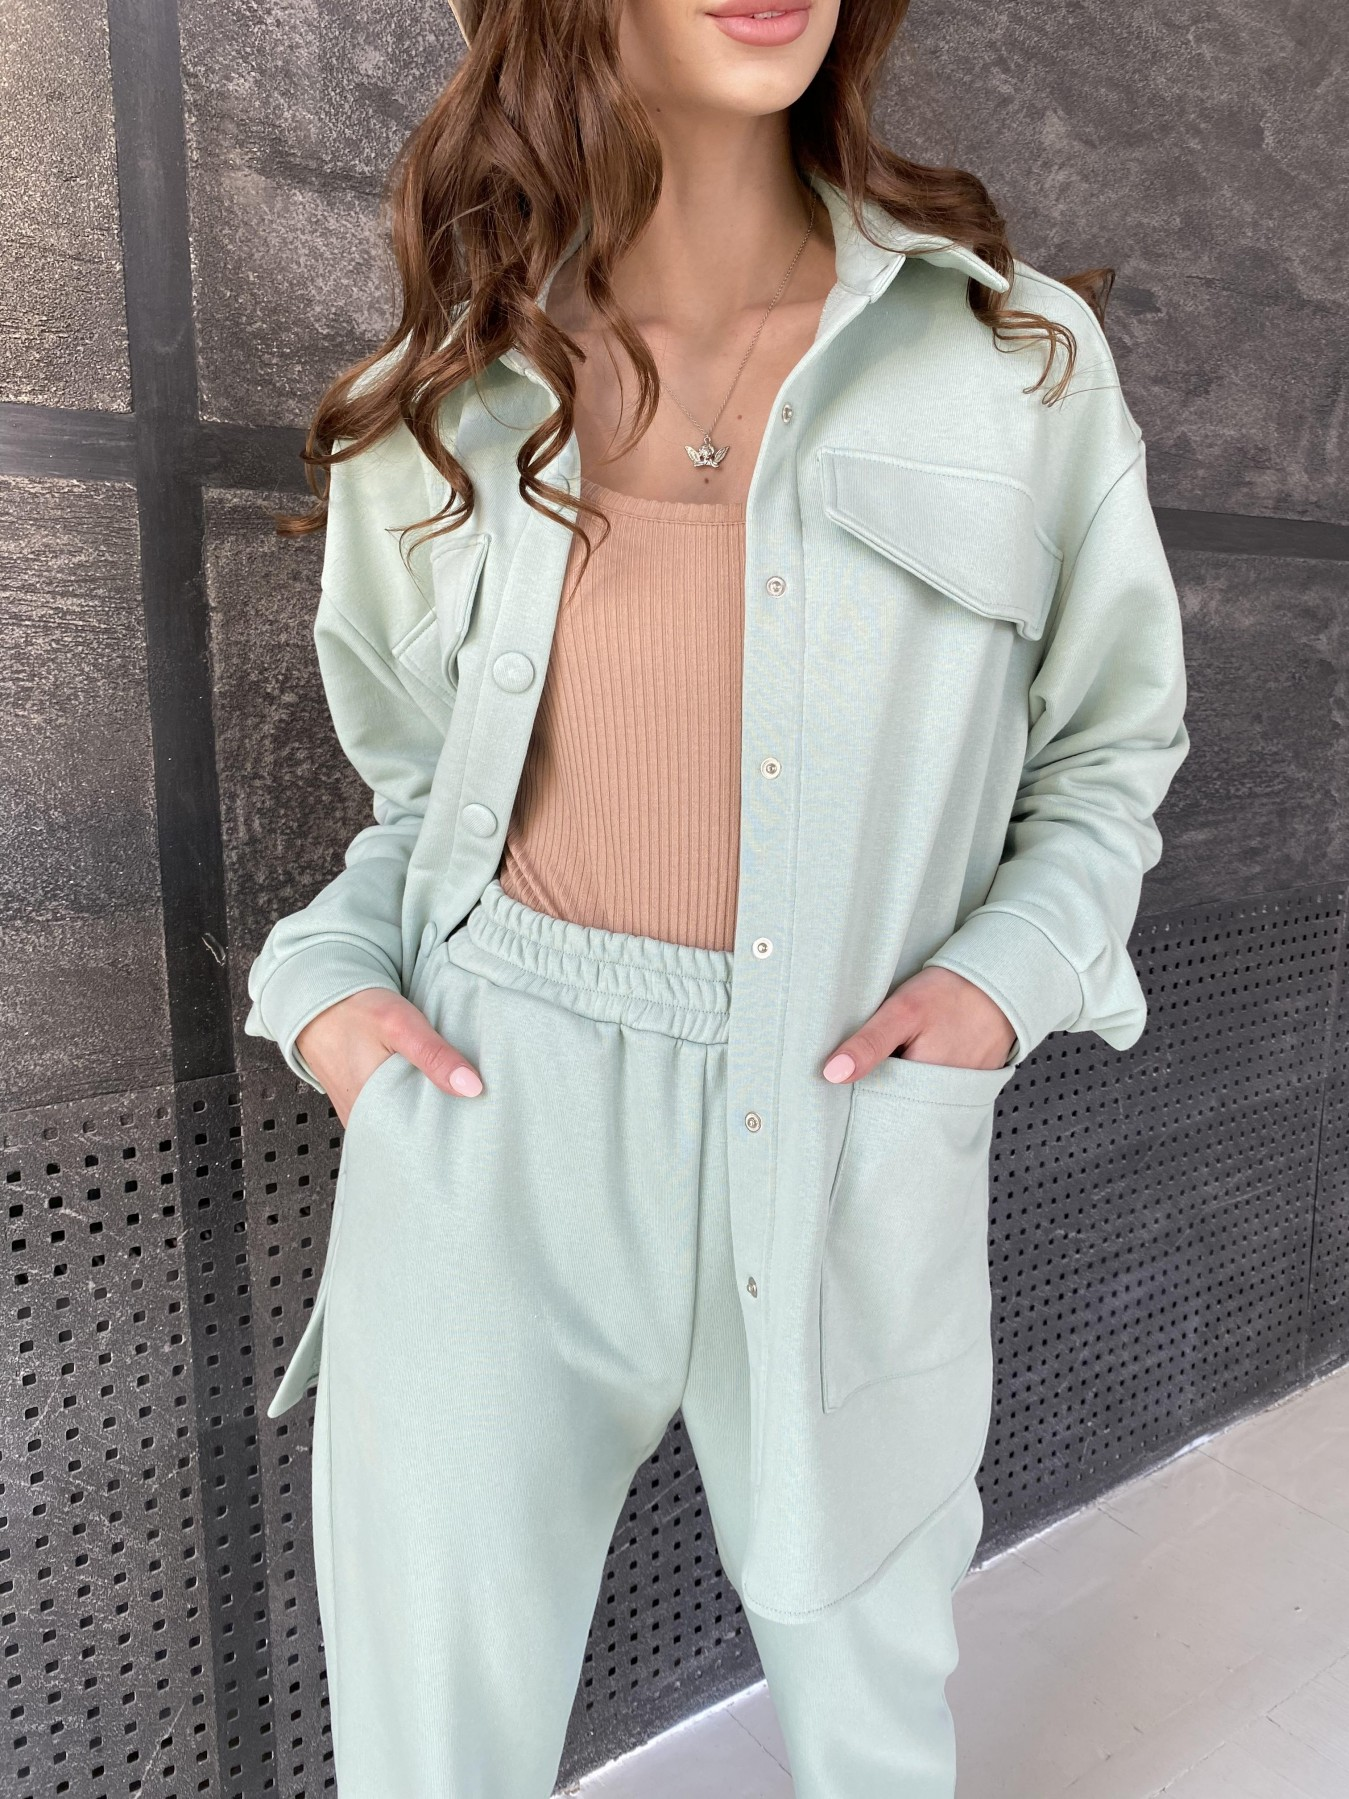 Респект костюм из трикотажа  3х нитка 11055 АРТ. 47576 Цвет: Олива Светлая - фото 5, интернет магазин tm-modus.ru